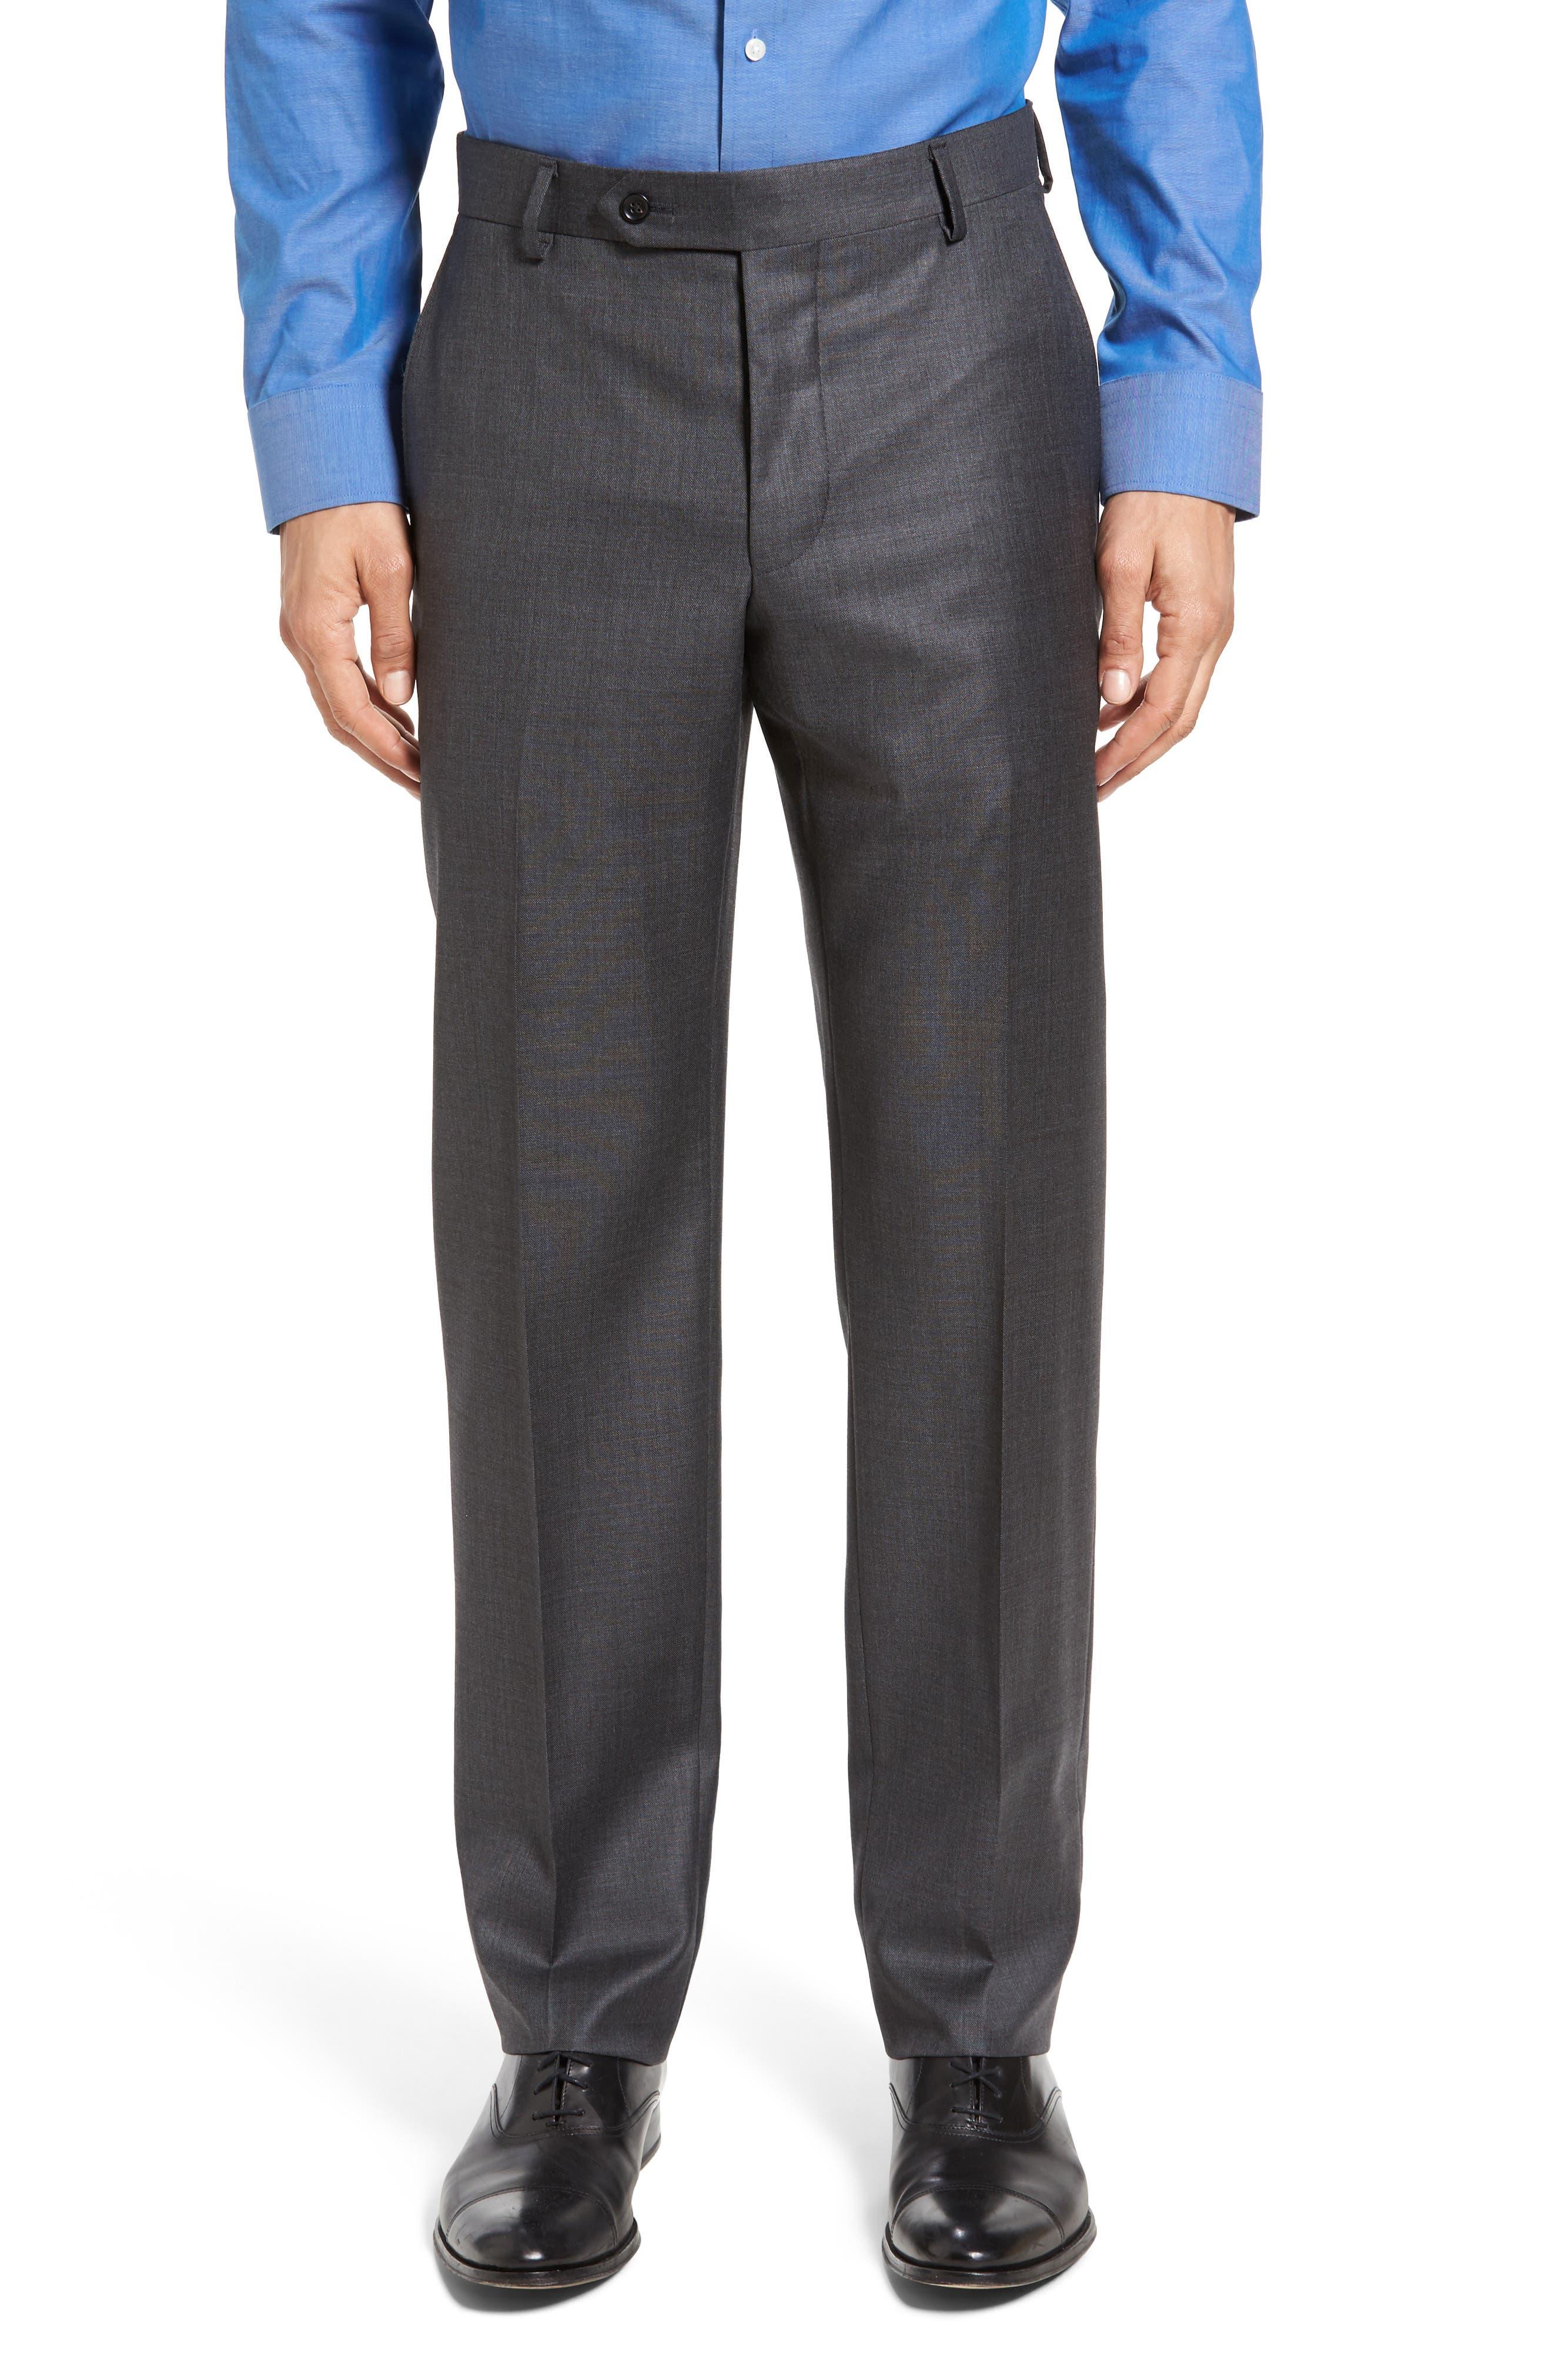 SAMUELSOHN,                             Beckett Classic Fit Sharkskin Wool Suit,                             Alternate thumbnail 6, color,                             020